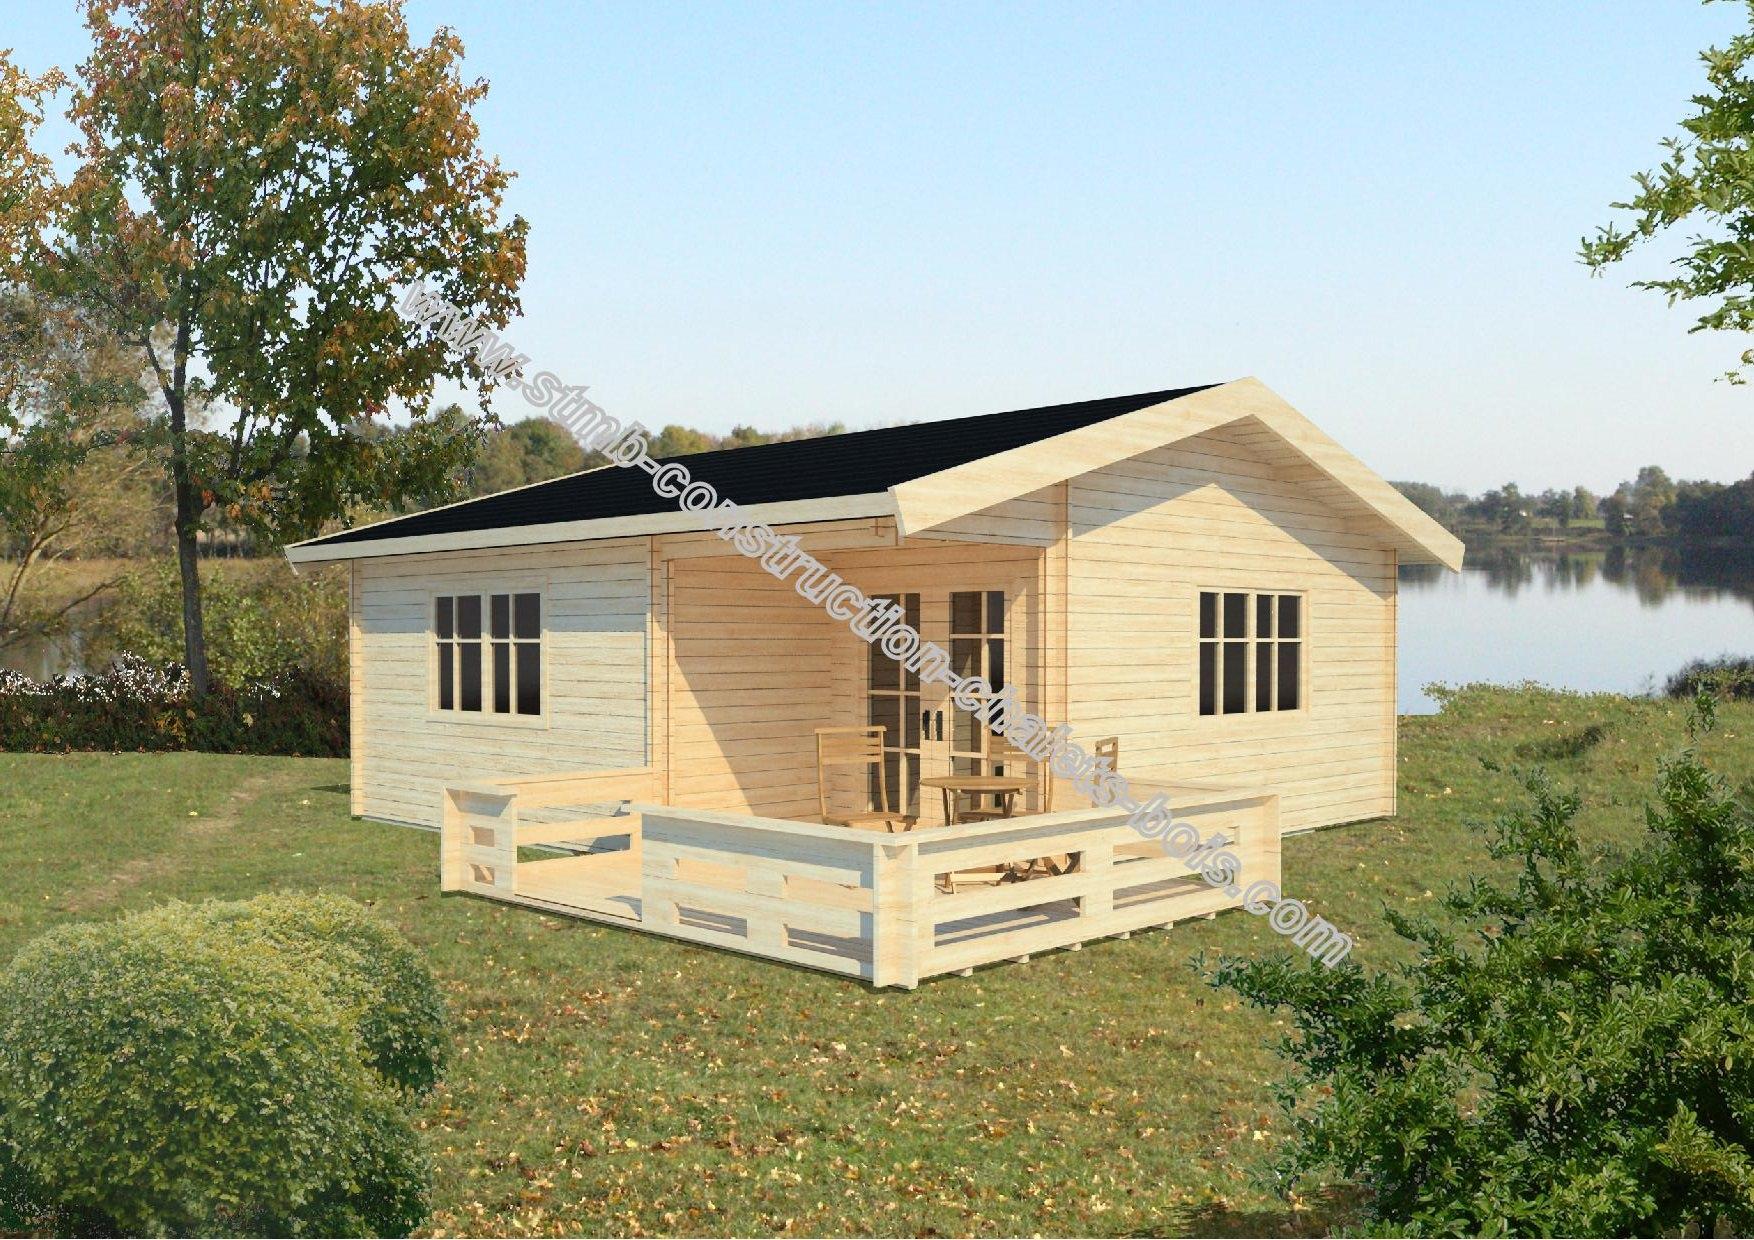 Chalet en bois habitable amiens 36 m2 stmb construction for Chalet en bois habitable